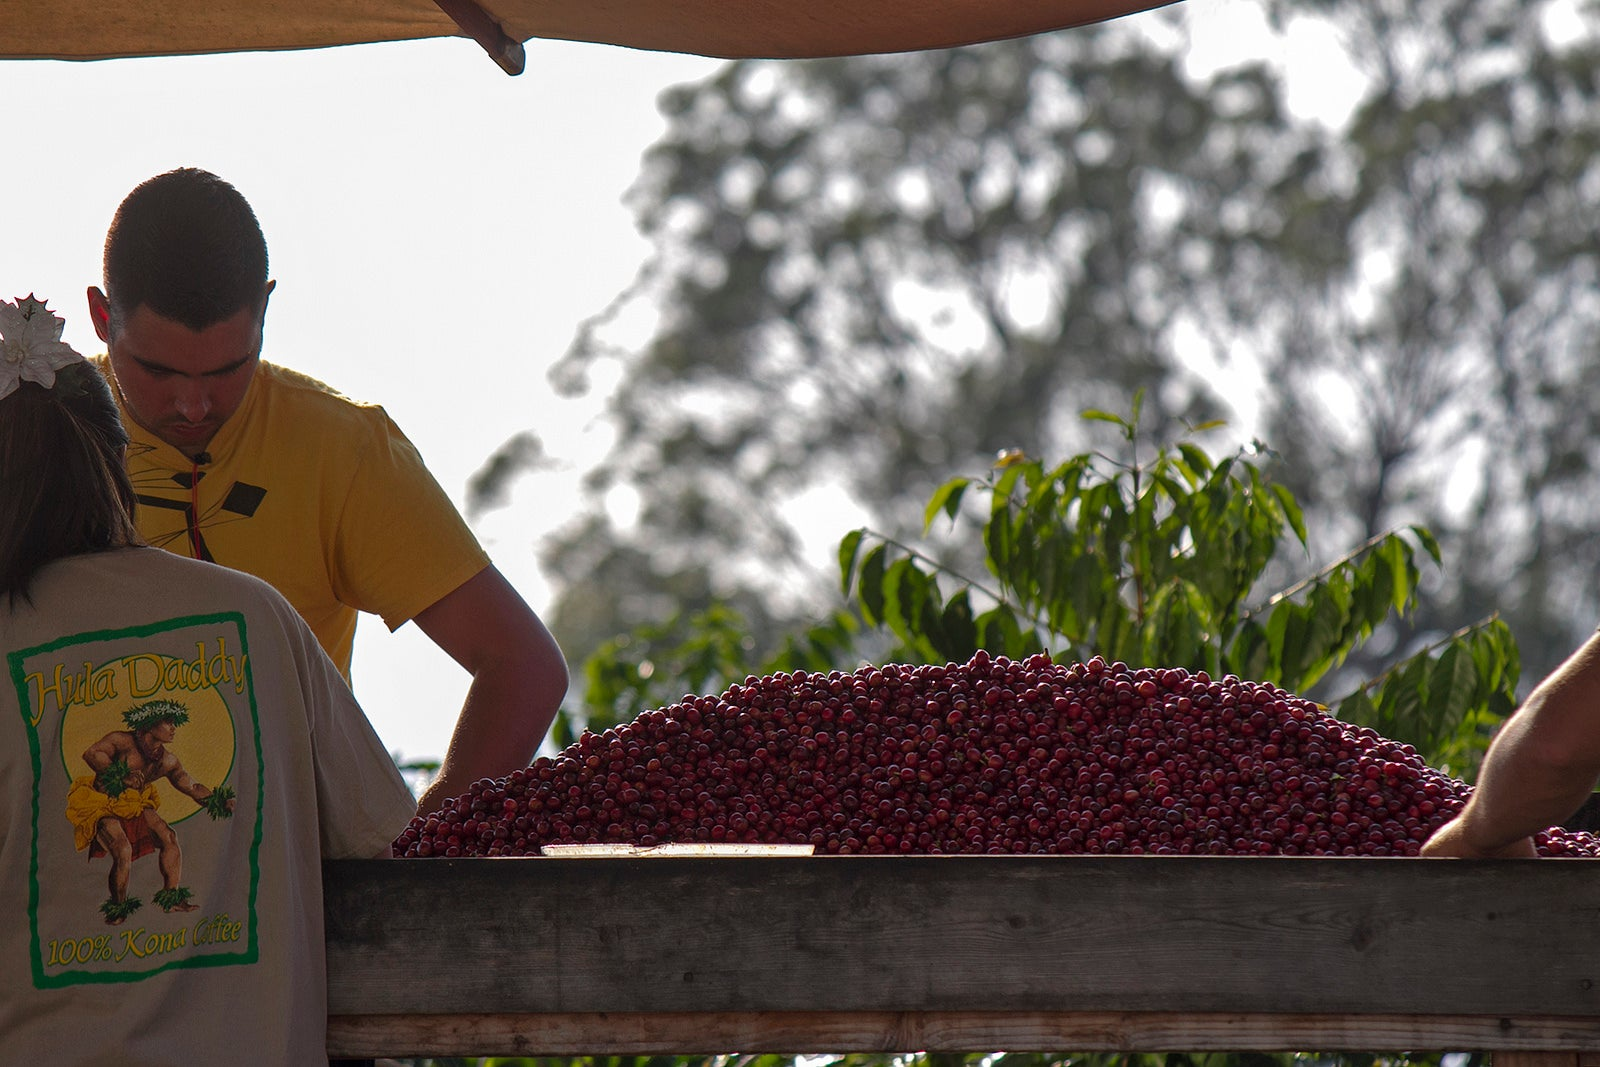 sorting coffee beans at hula daddy coffee farm